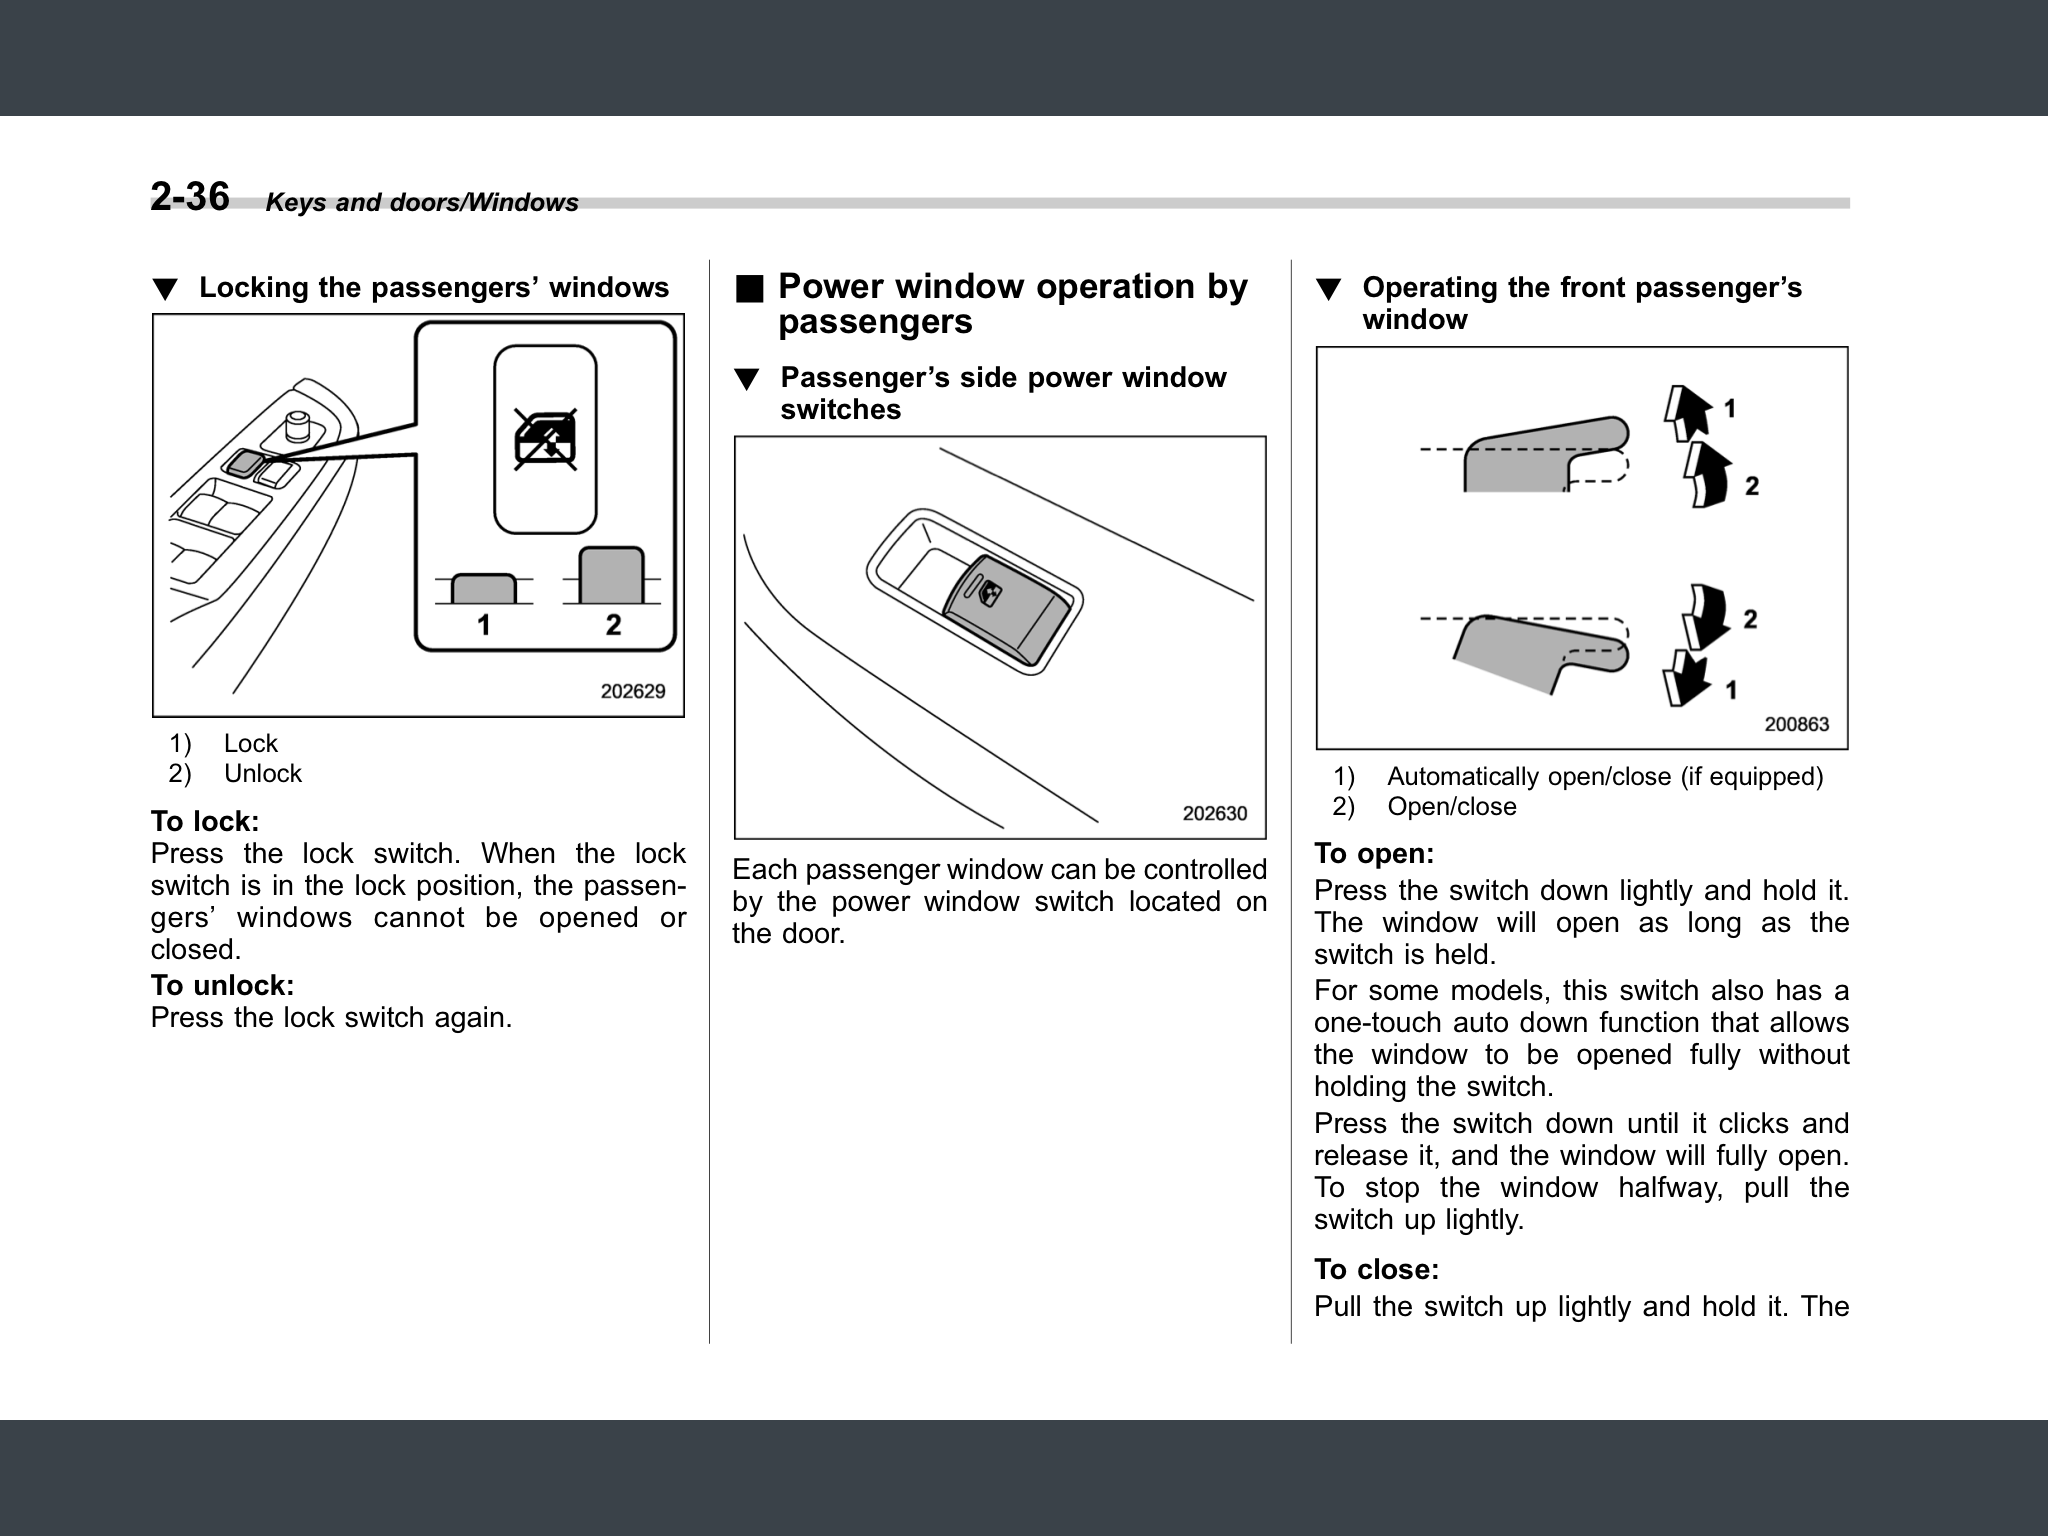 Suddenly, three of my (Subaru Outback) car windows stopped ... on subaru outback wiring layout, subaru transaxle diagram, subaru drivetrain diagram, subaru electrical diagrams, subaru electrical schematics, subaru parts diagram, subaru charging system, subaru air conditioning diagram, subaru fuel diagram, subaru motor diagram, subaru body diagram, subaru fuse diagram, subaru engine compartment diagram, subaru radio wiring harness, subaru front axle diagram, subaru generator diagram, subaru alternator wiring, subaru transmission diagram, subaru coolant diagram, subaru relay diagram,